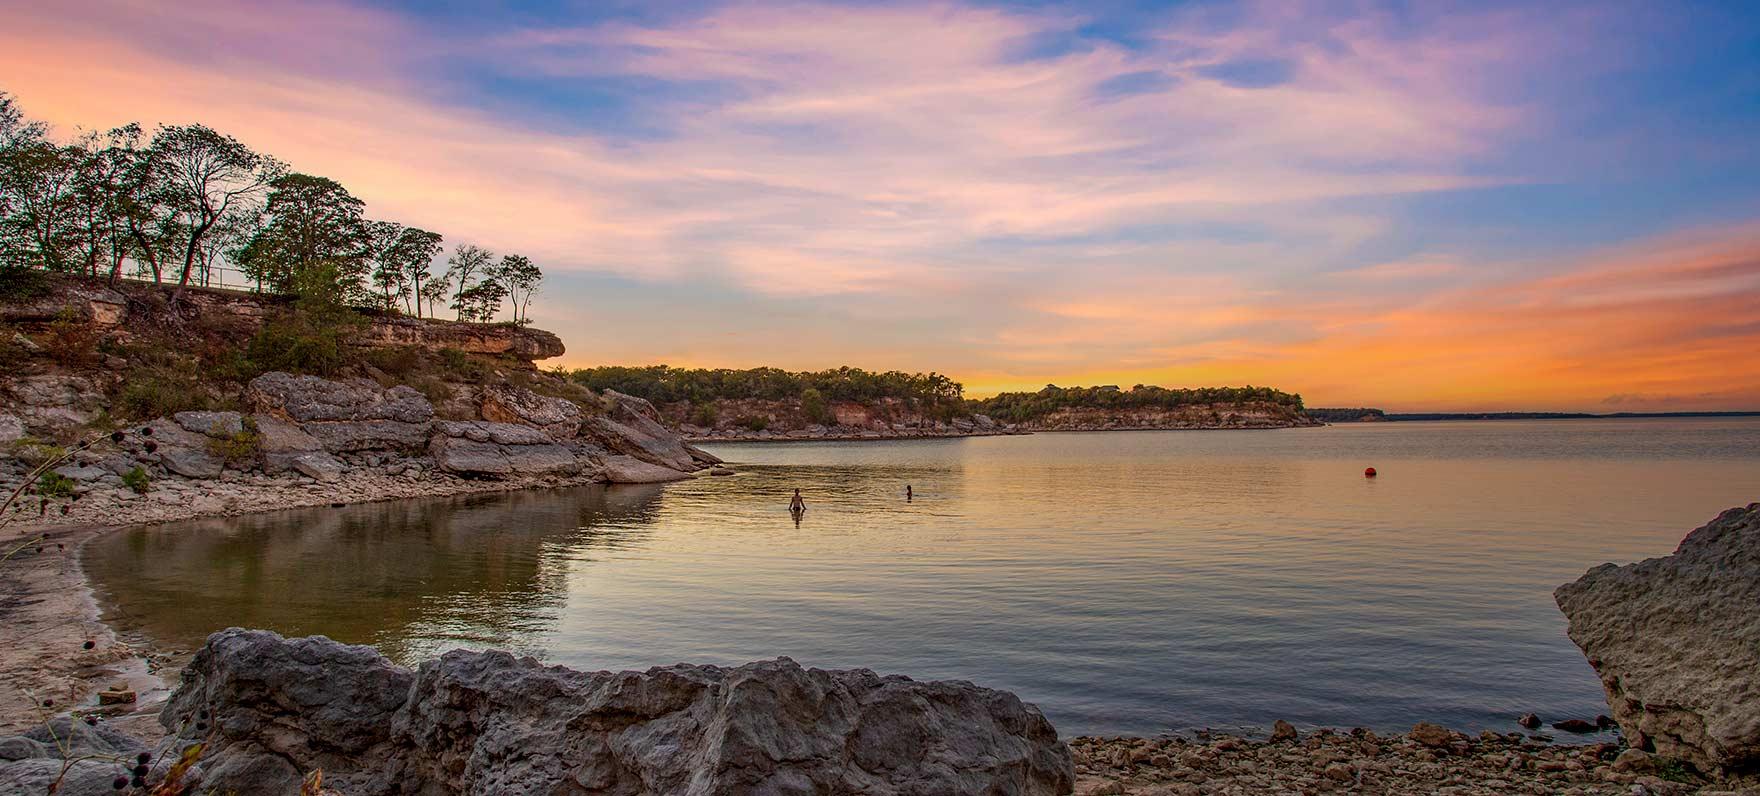 Eisenhower State Park Texas Parks Amp Wildlife Department